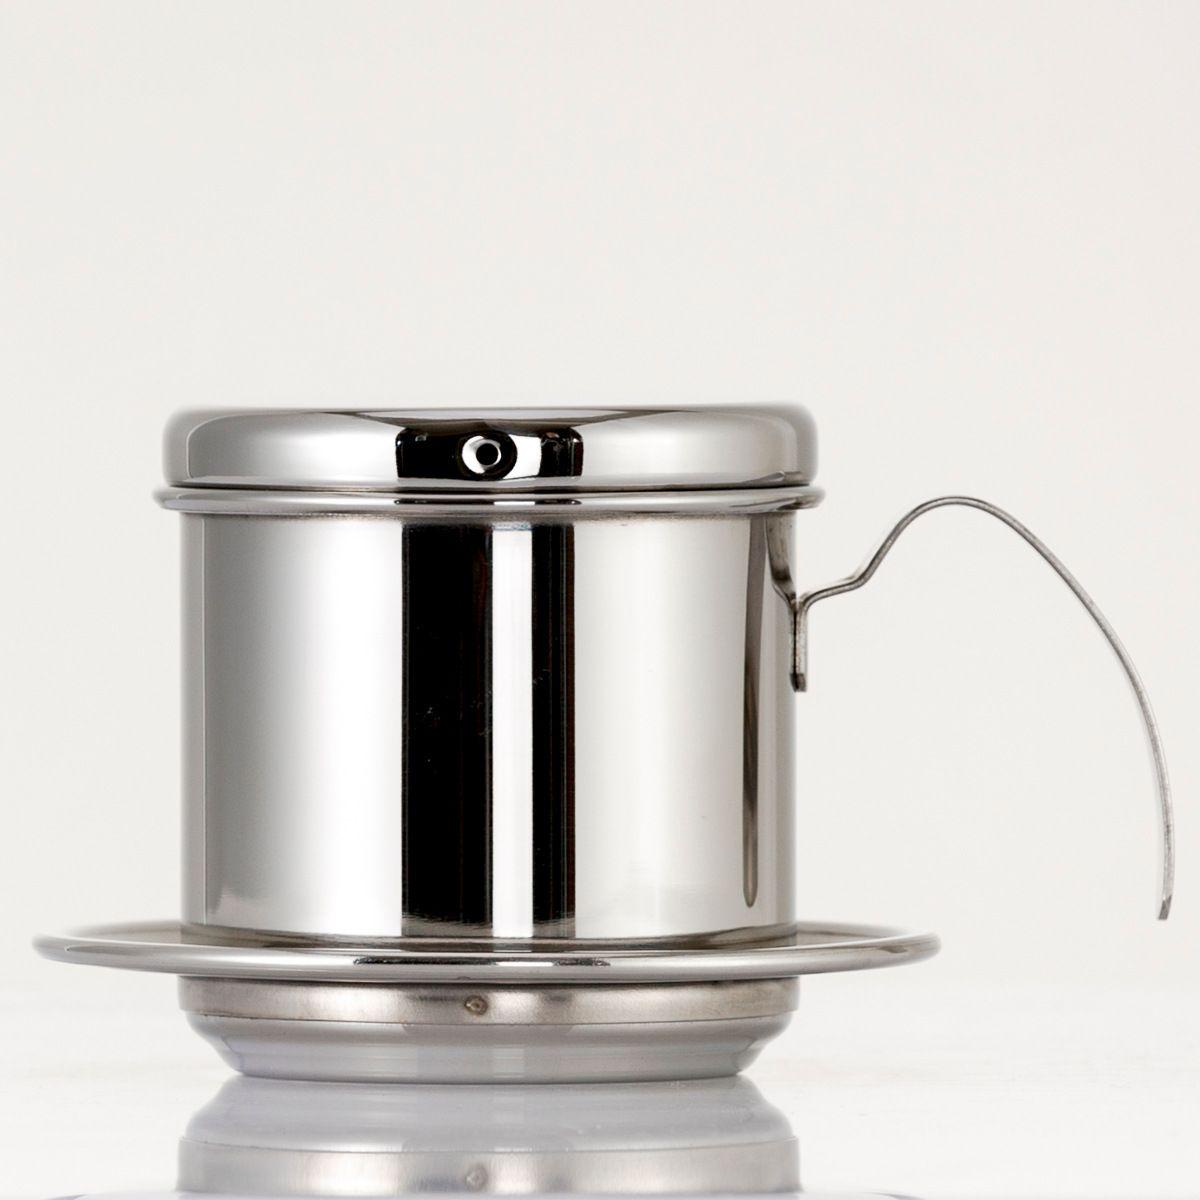 Vietnam-Art-Kaffeetasse-Schalen-Krug-Edelstahl-Metallvietnamesische Kaffee-Tropfenfänger-Schalen-Filter-Hersteller-Sieb-kühles perfektes